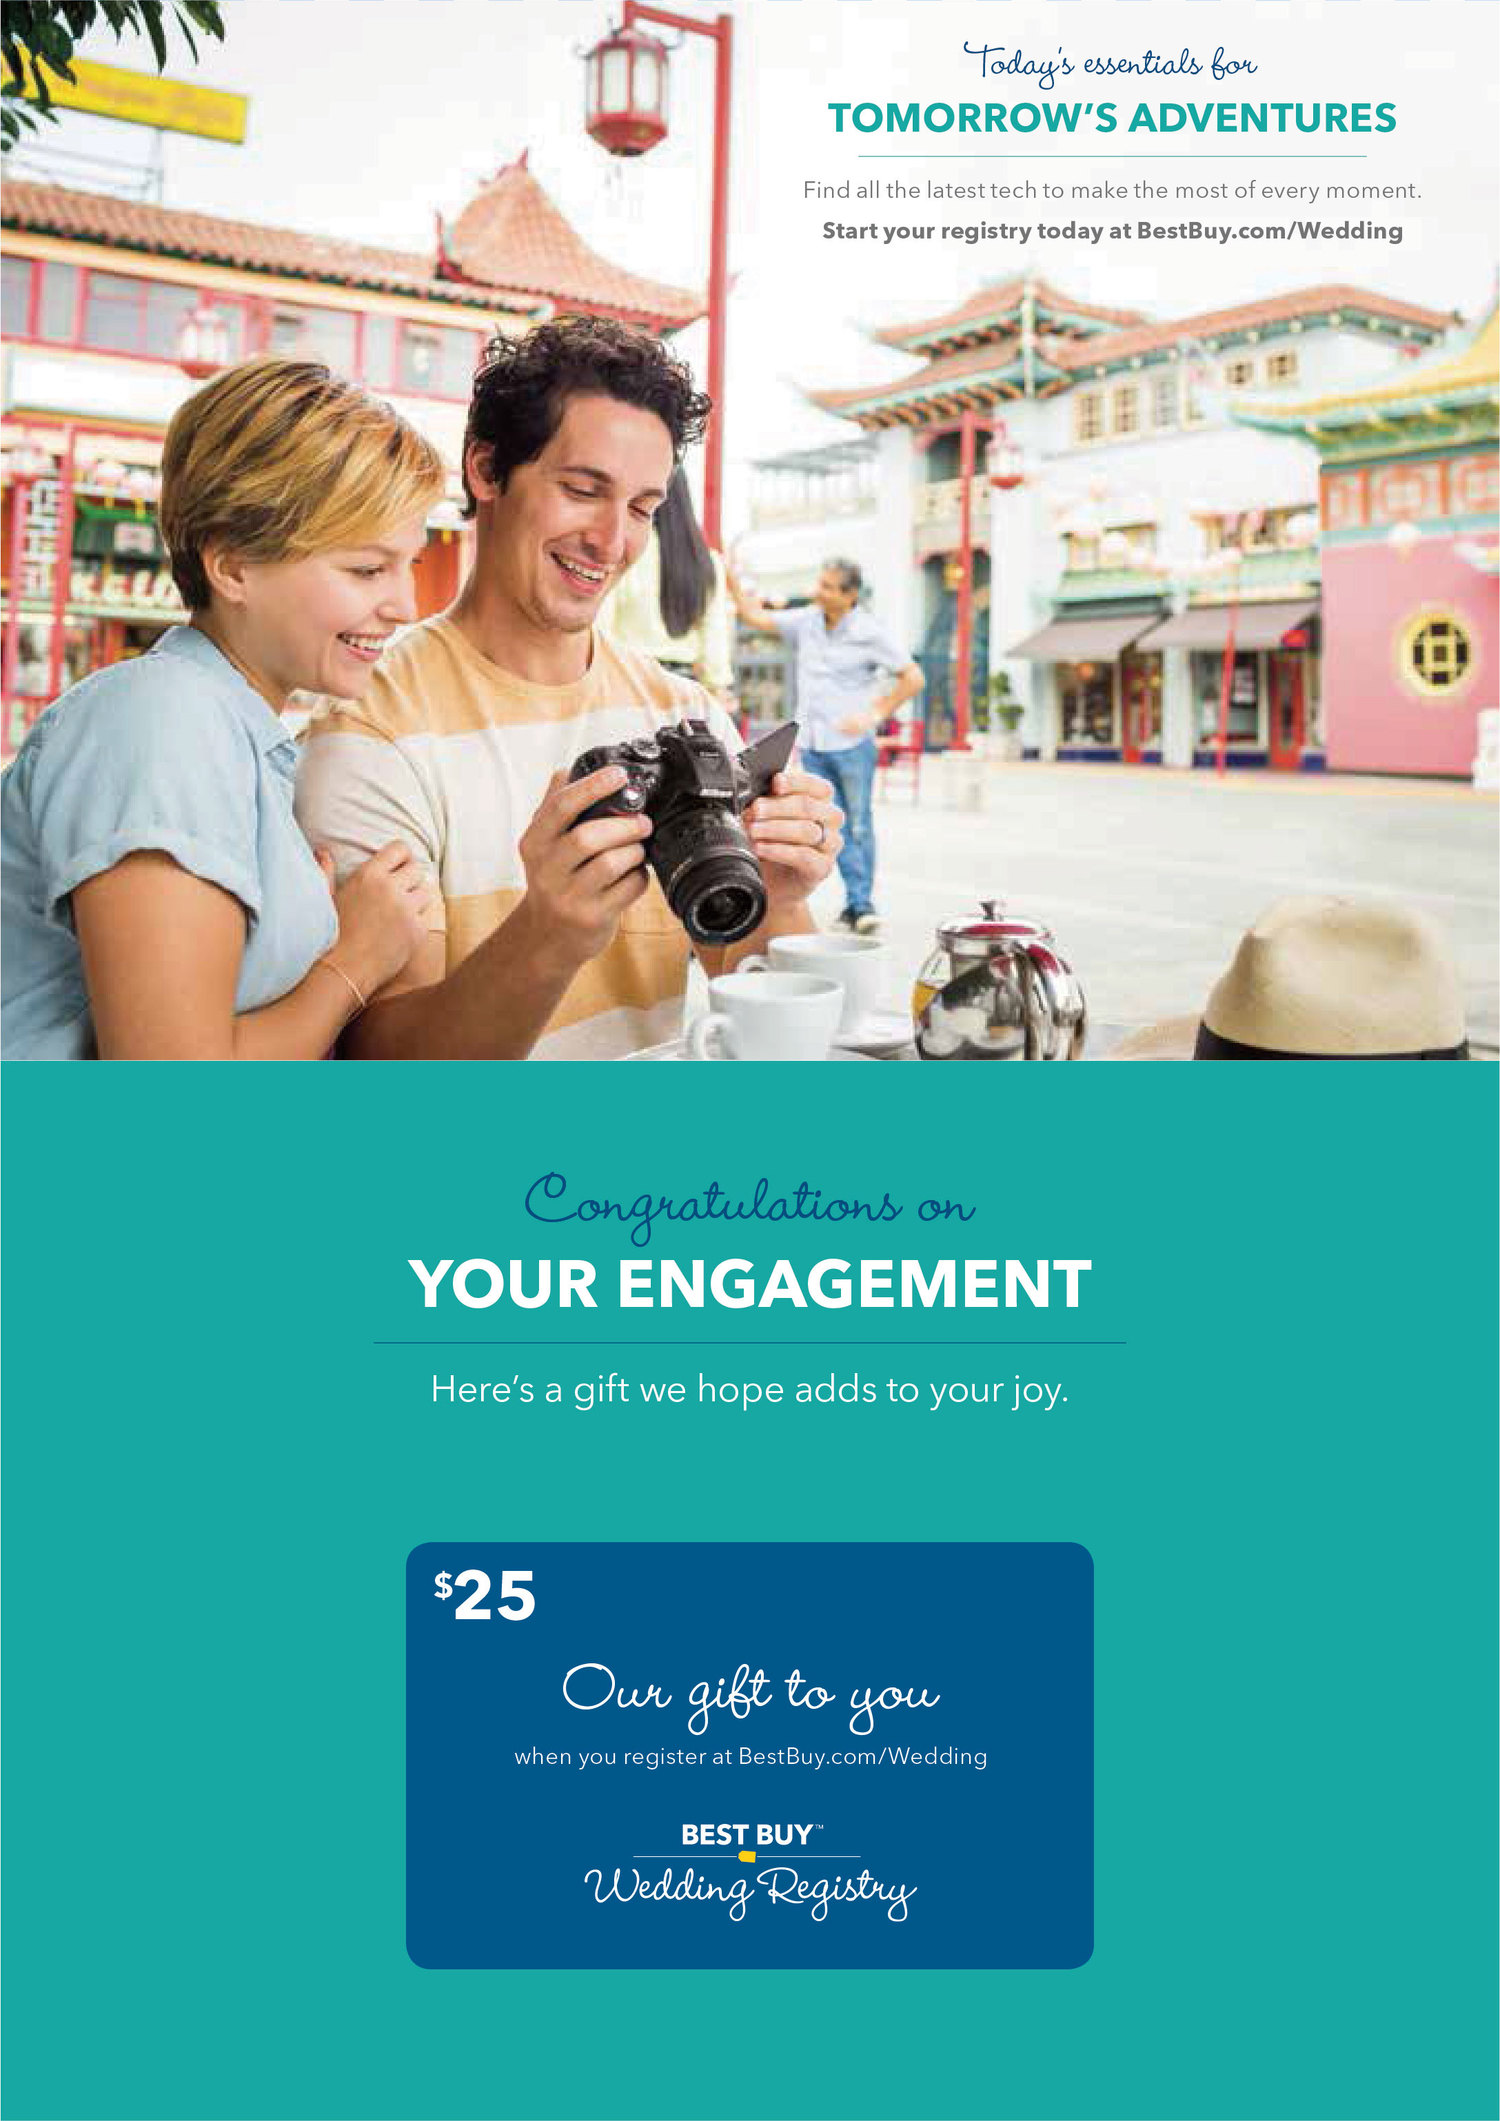 Best Buy Wedding Registry | Best Buy Wedding Registry Direct Mailer Amy Grace Design